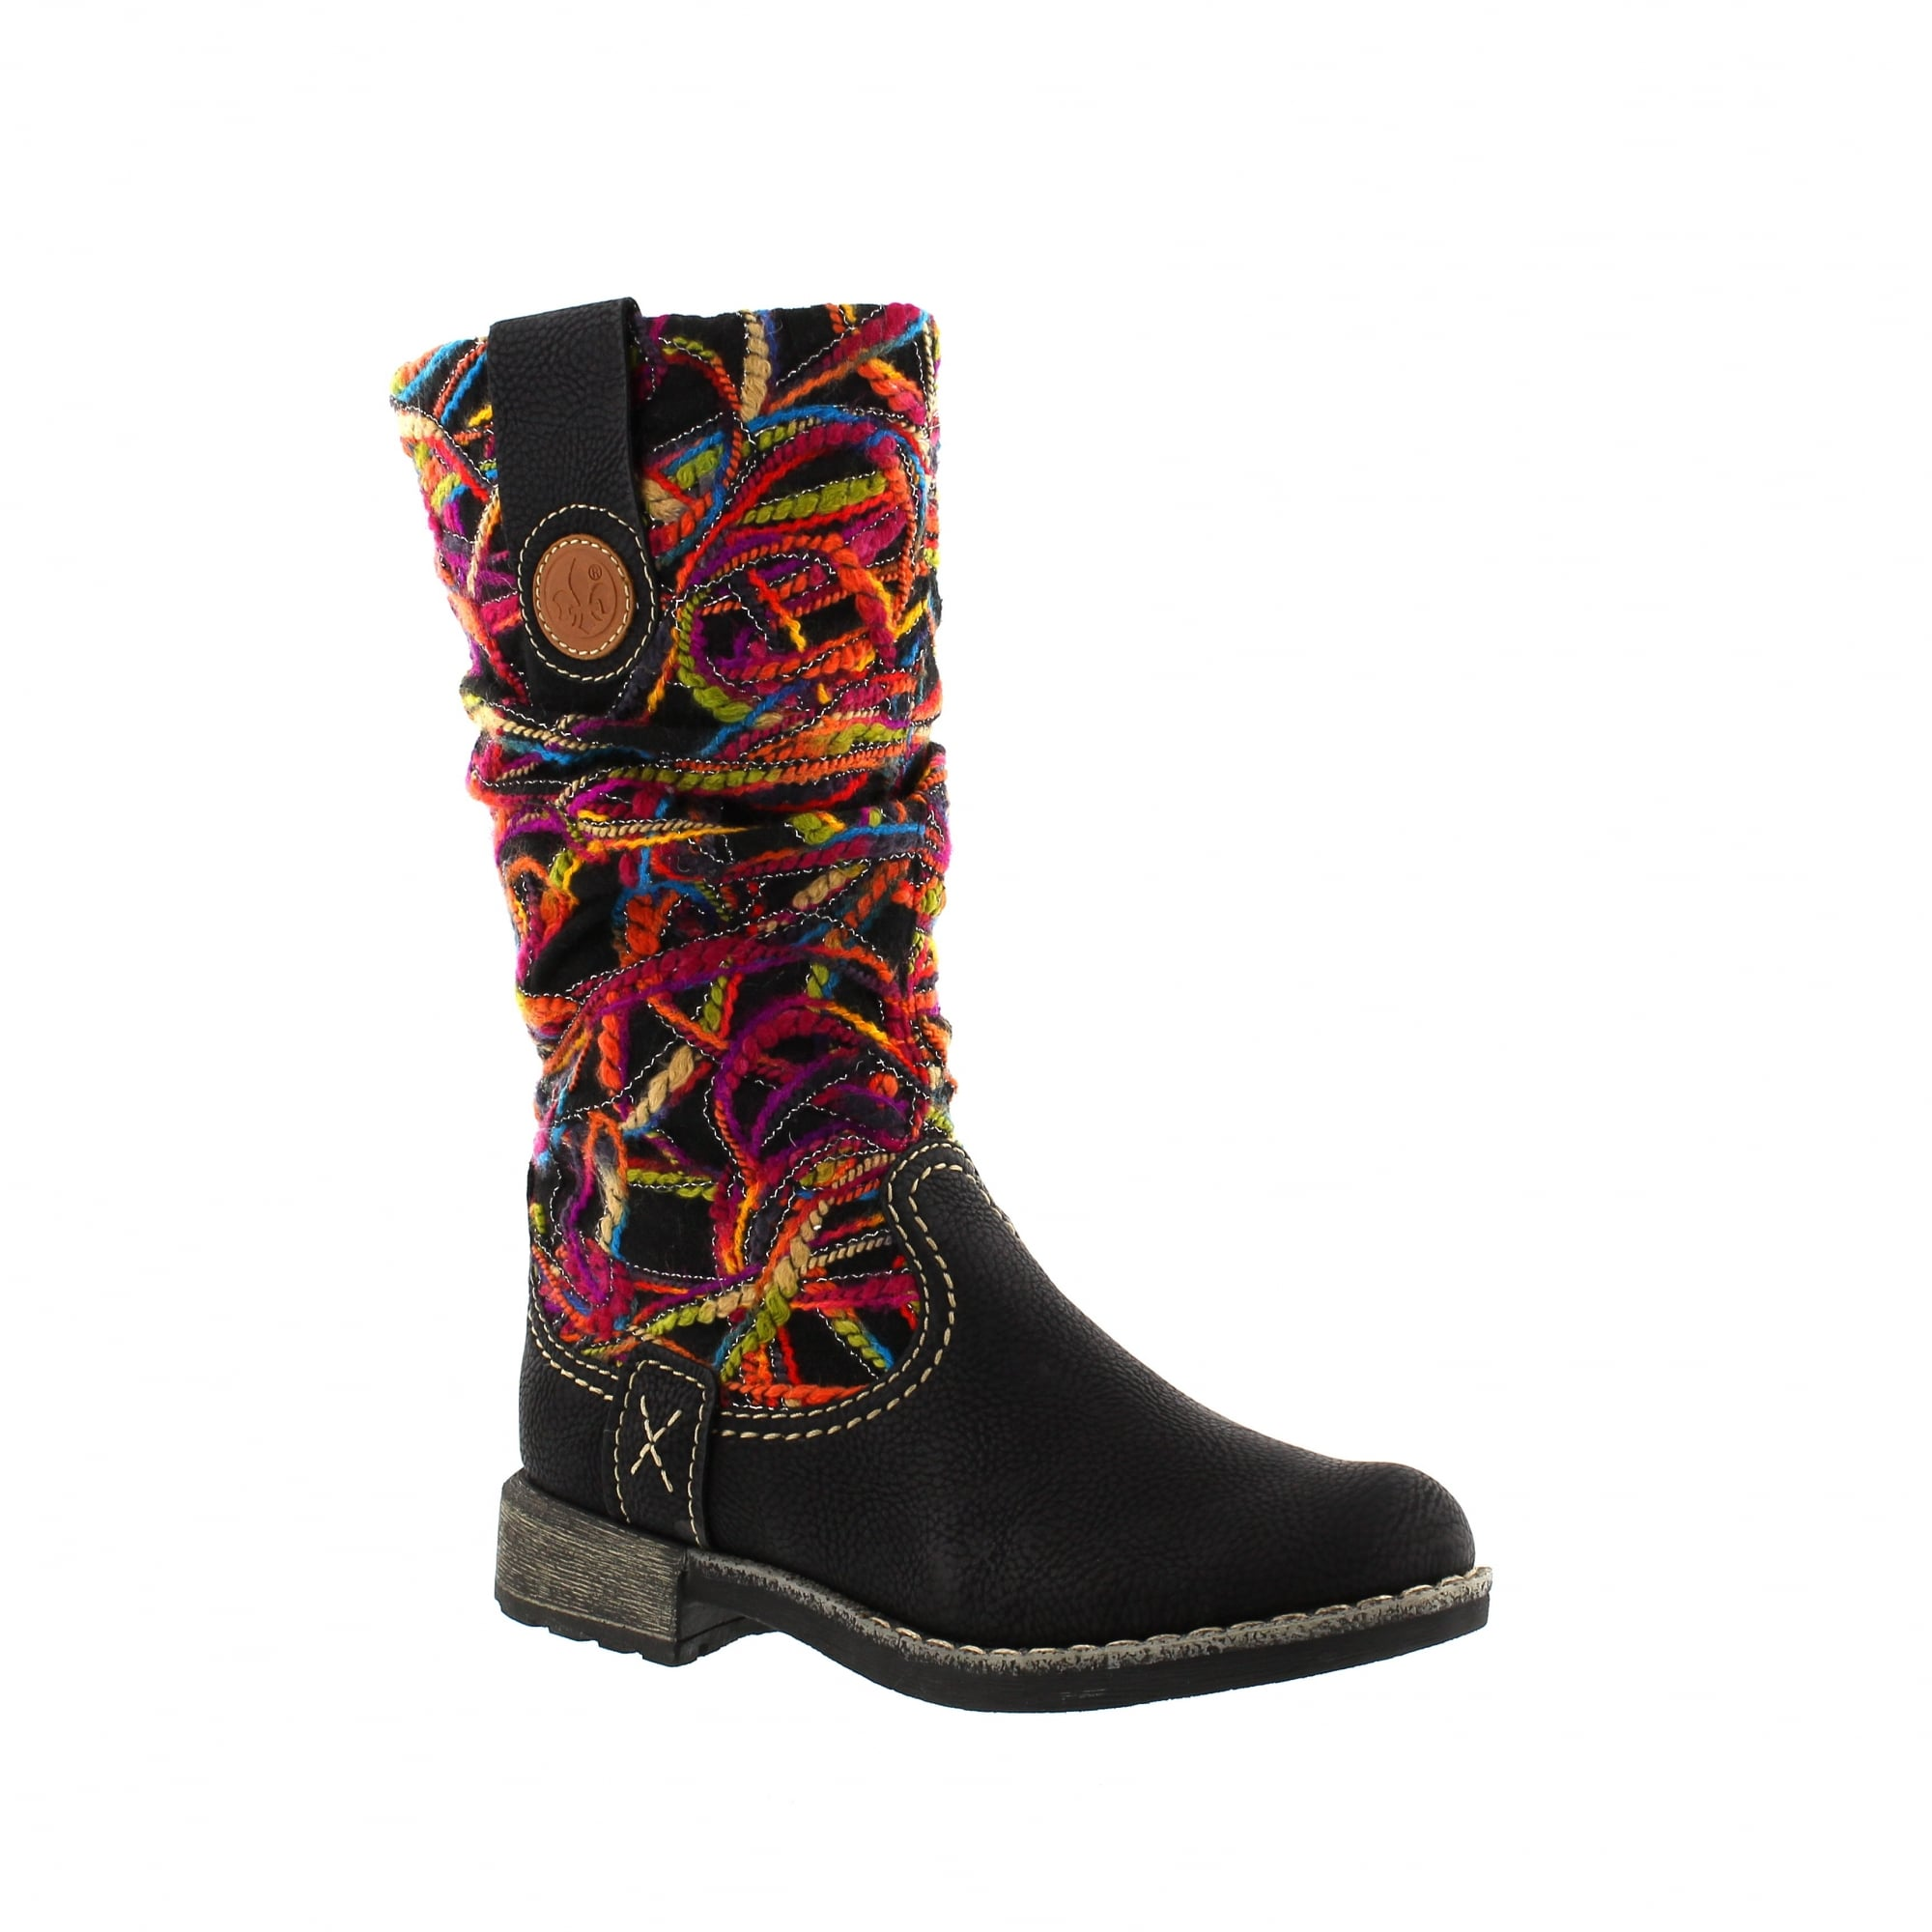 3d2209125ed Rieker 74663-00 Black Fuchsia Womens Mid Calf Boots